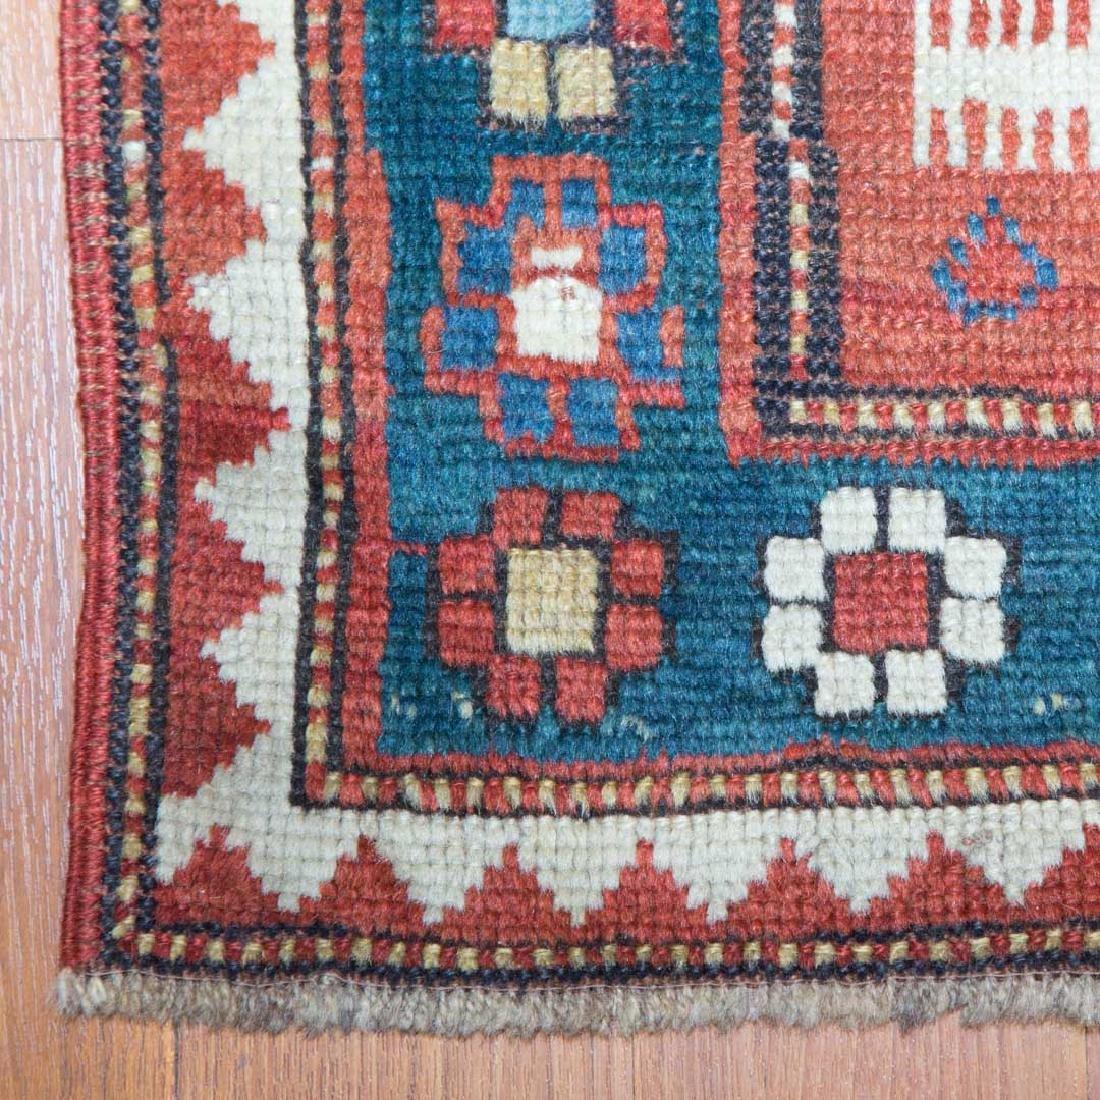 Antique Kazak rug, approx. 3.10 x 7.7 - 2